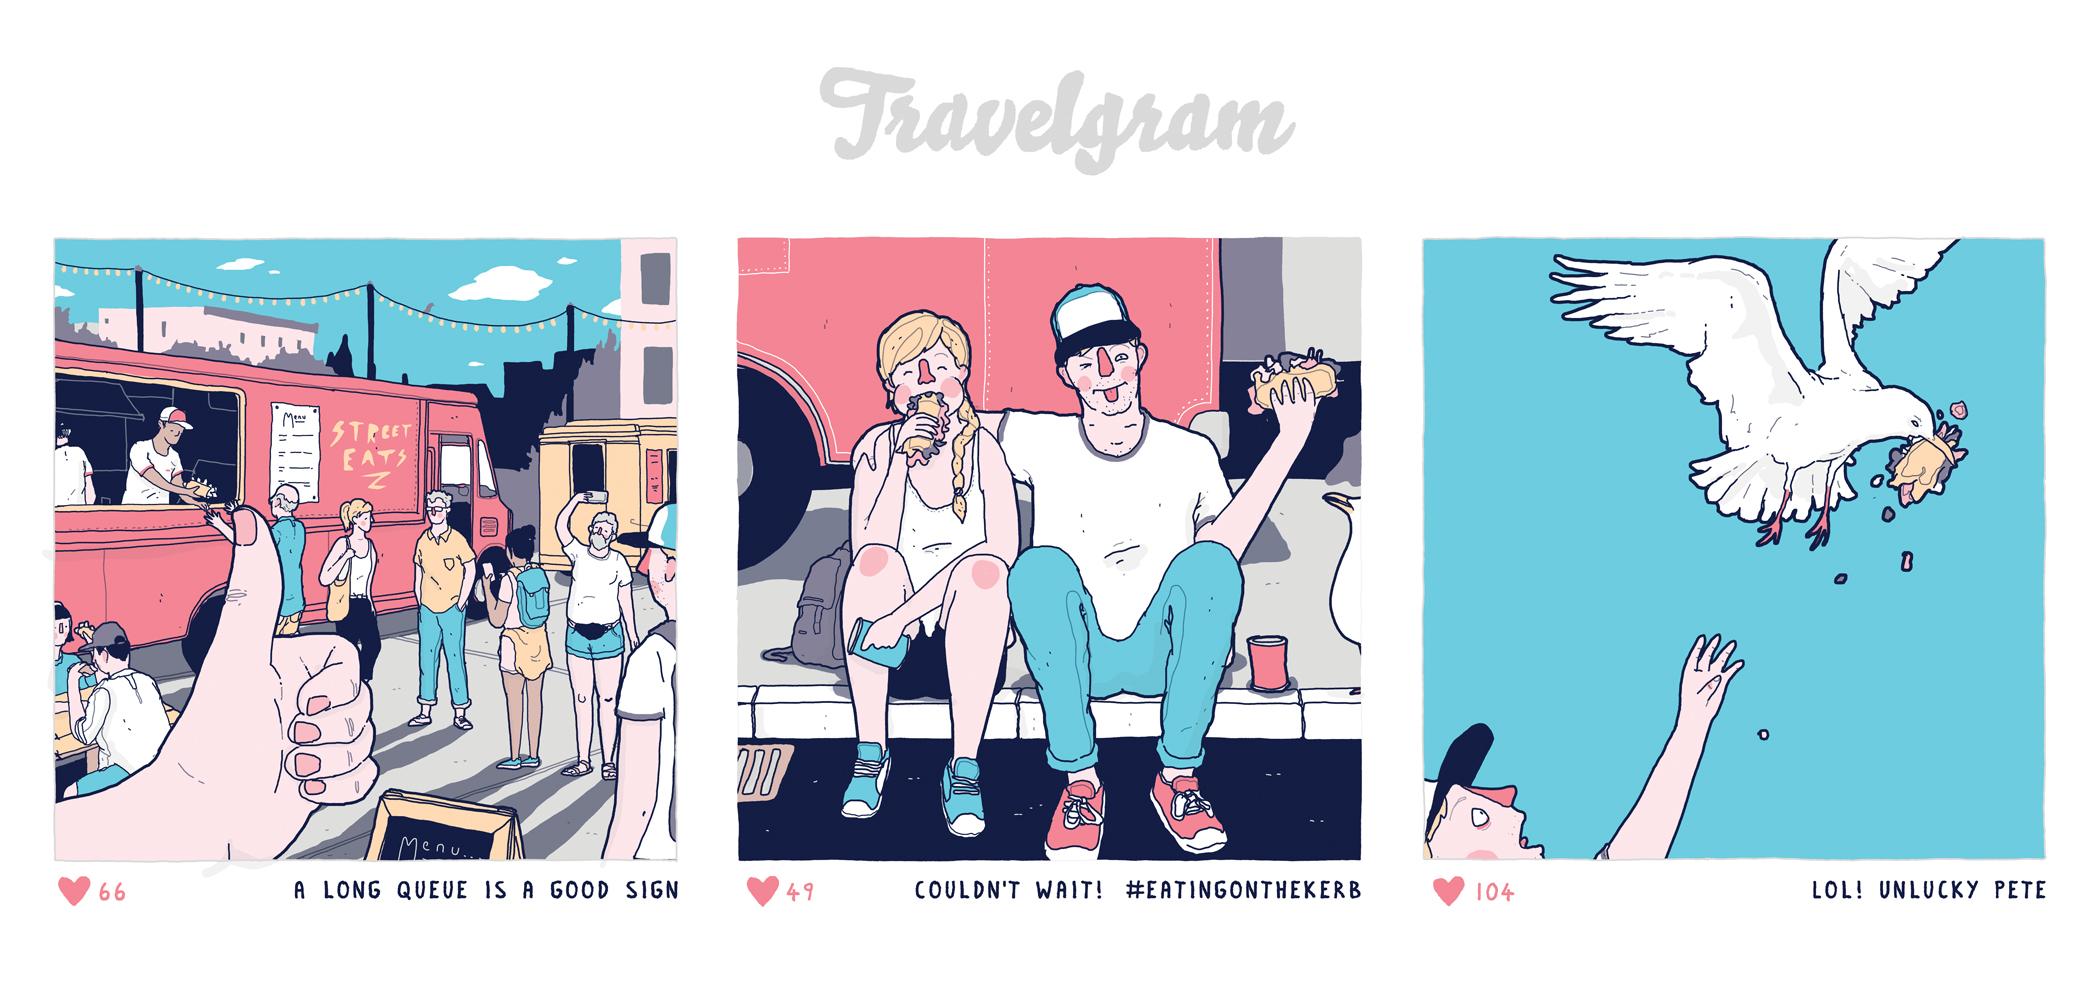 travelgram-web-06-street-food.jpg